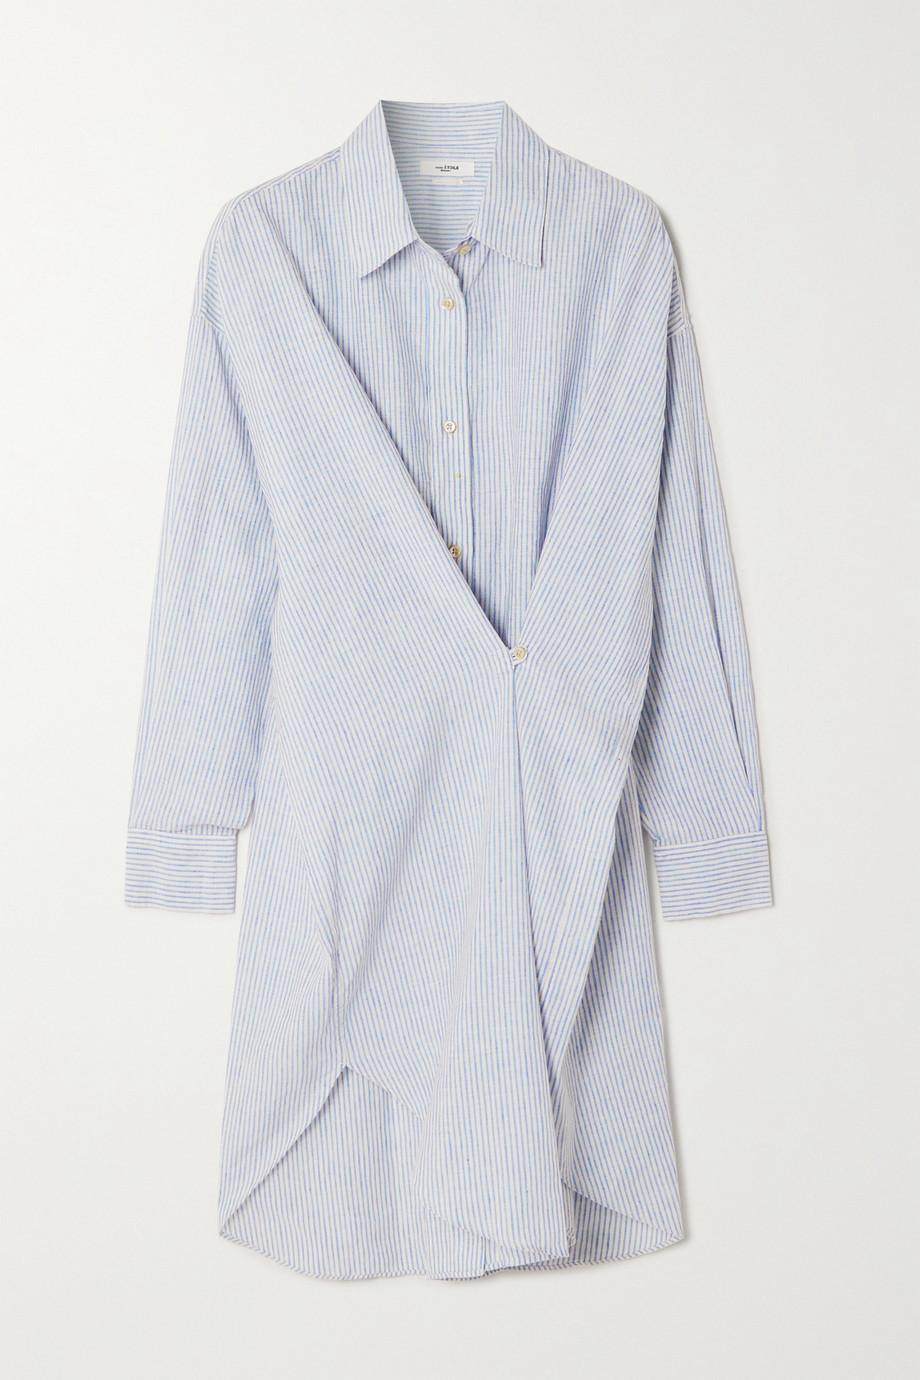 Isabel Marant Étoile Seen gathered striped cotton and linen-blend shirt dress